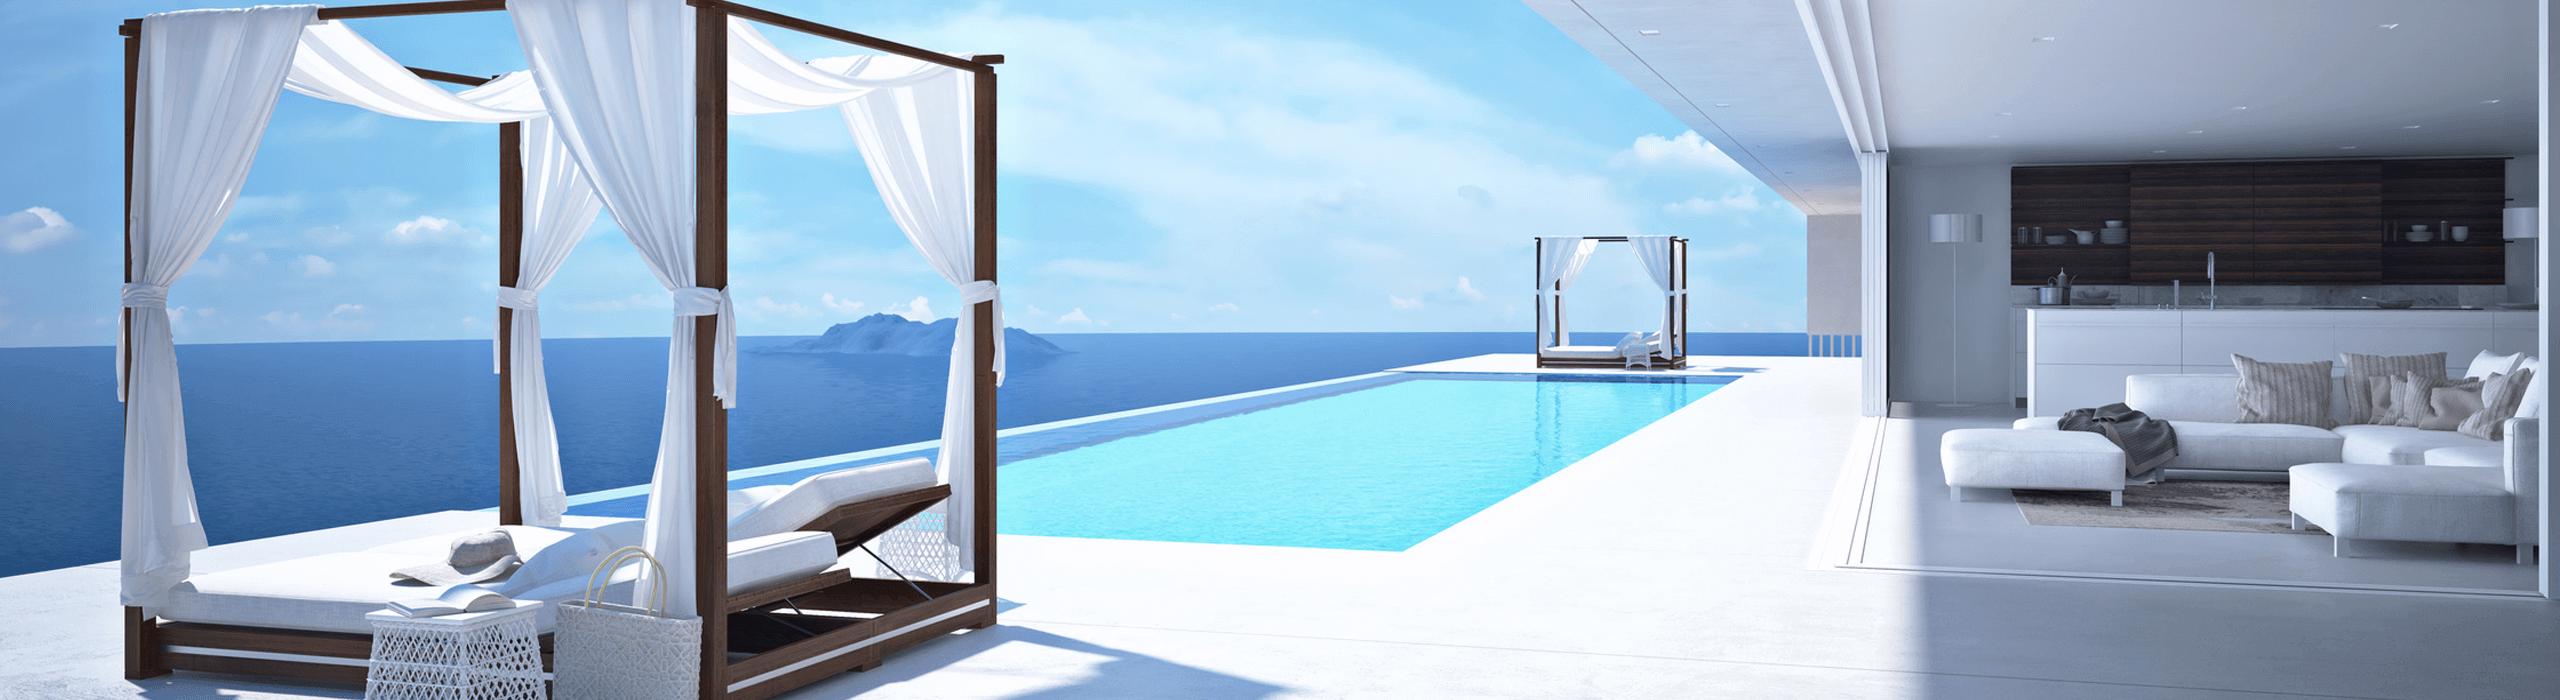 piscine et spa le comptoir des energies. Black Bedroom Furniture Sets. Home Design Ideas